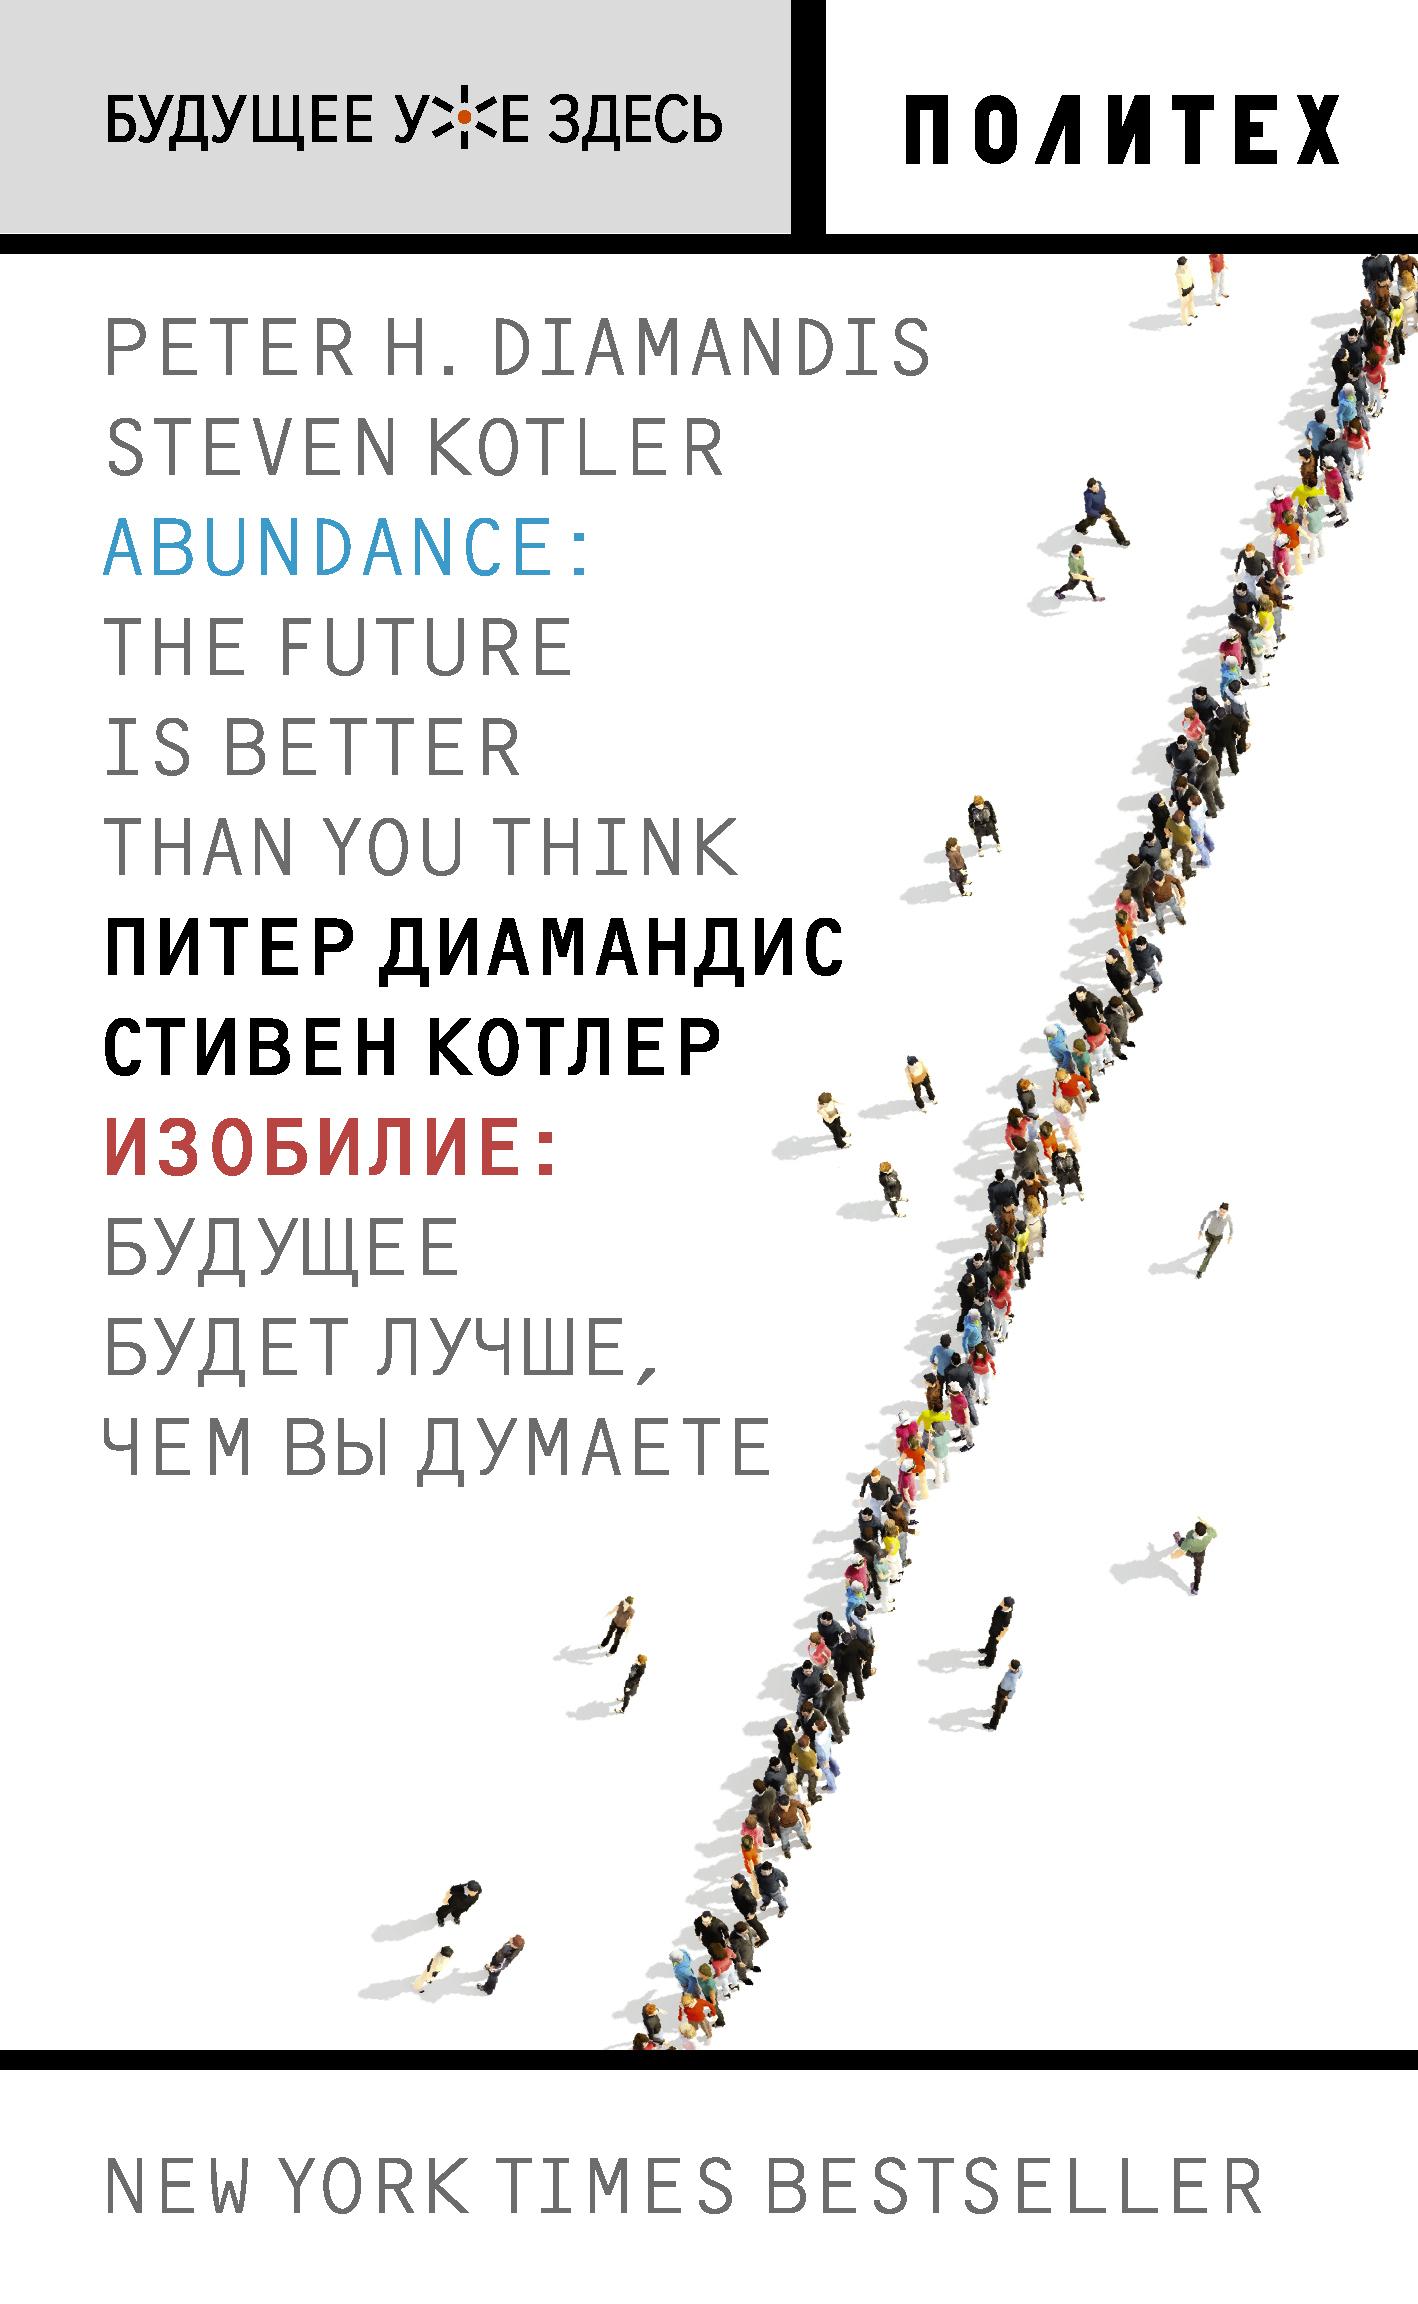 Обложка книги. Автор - Питер Диамандис